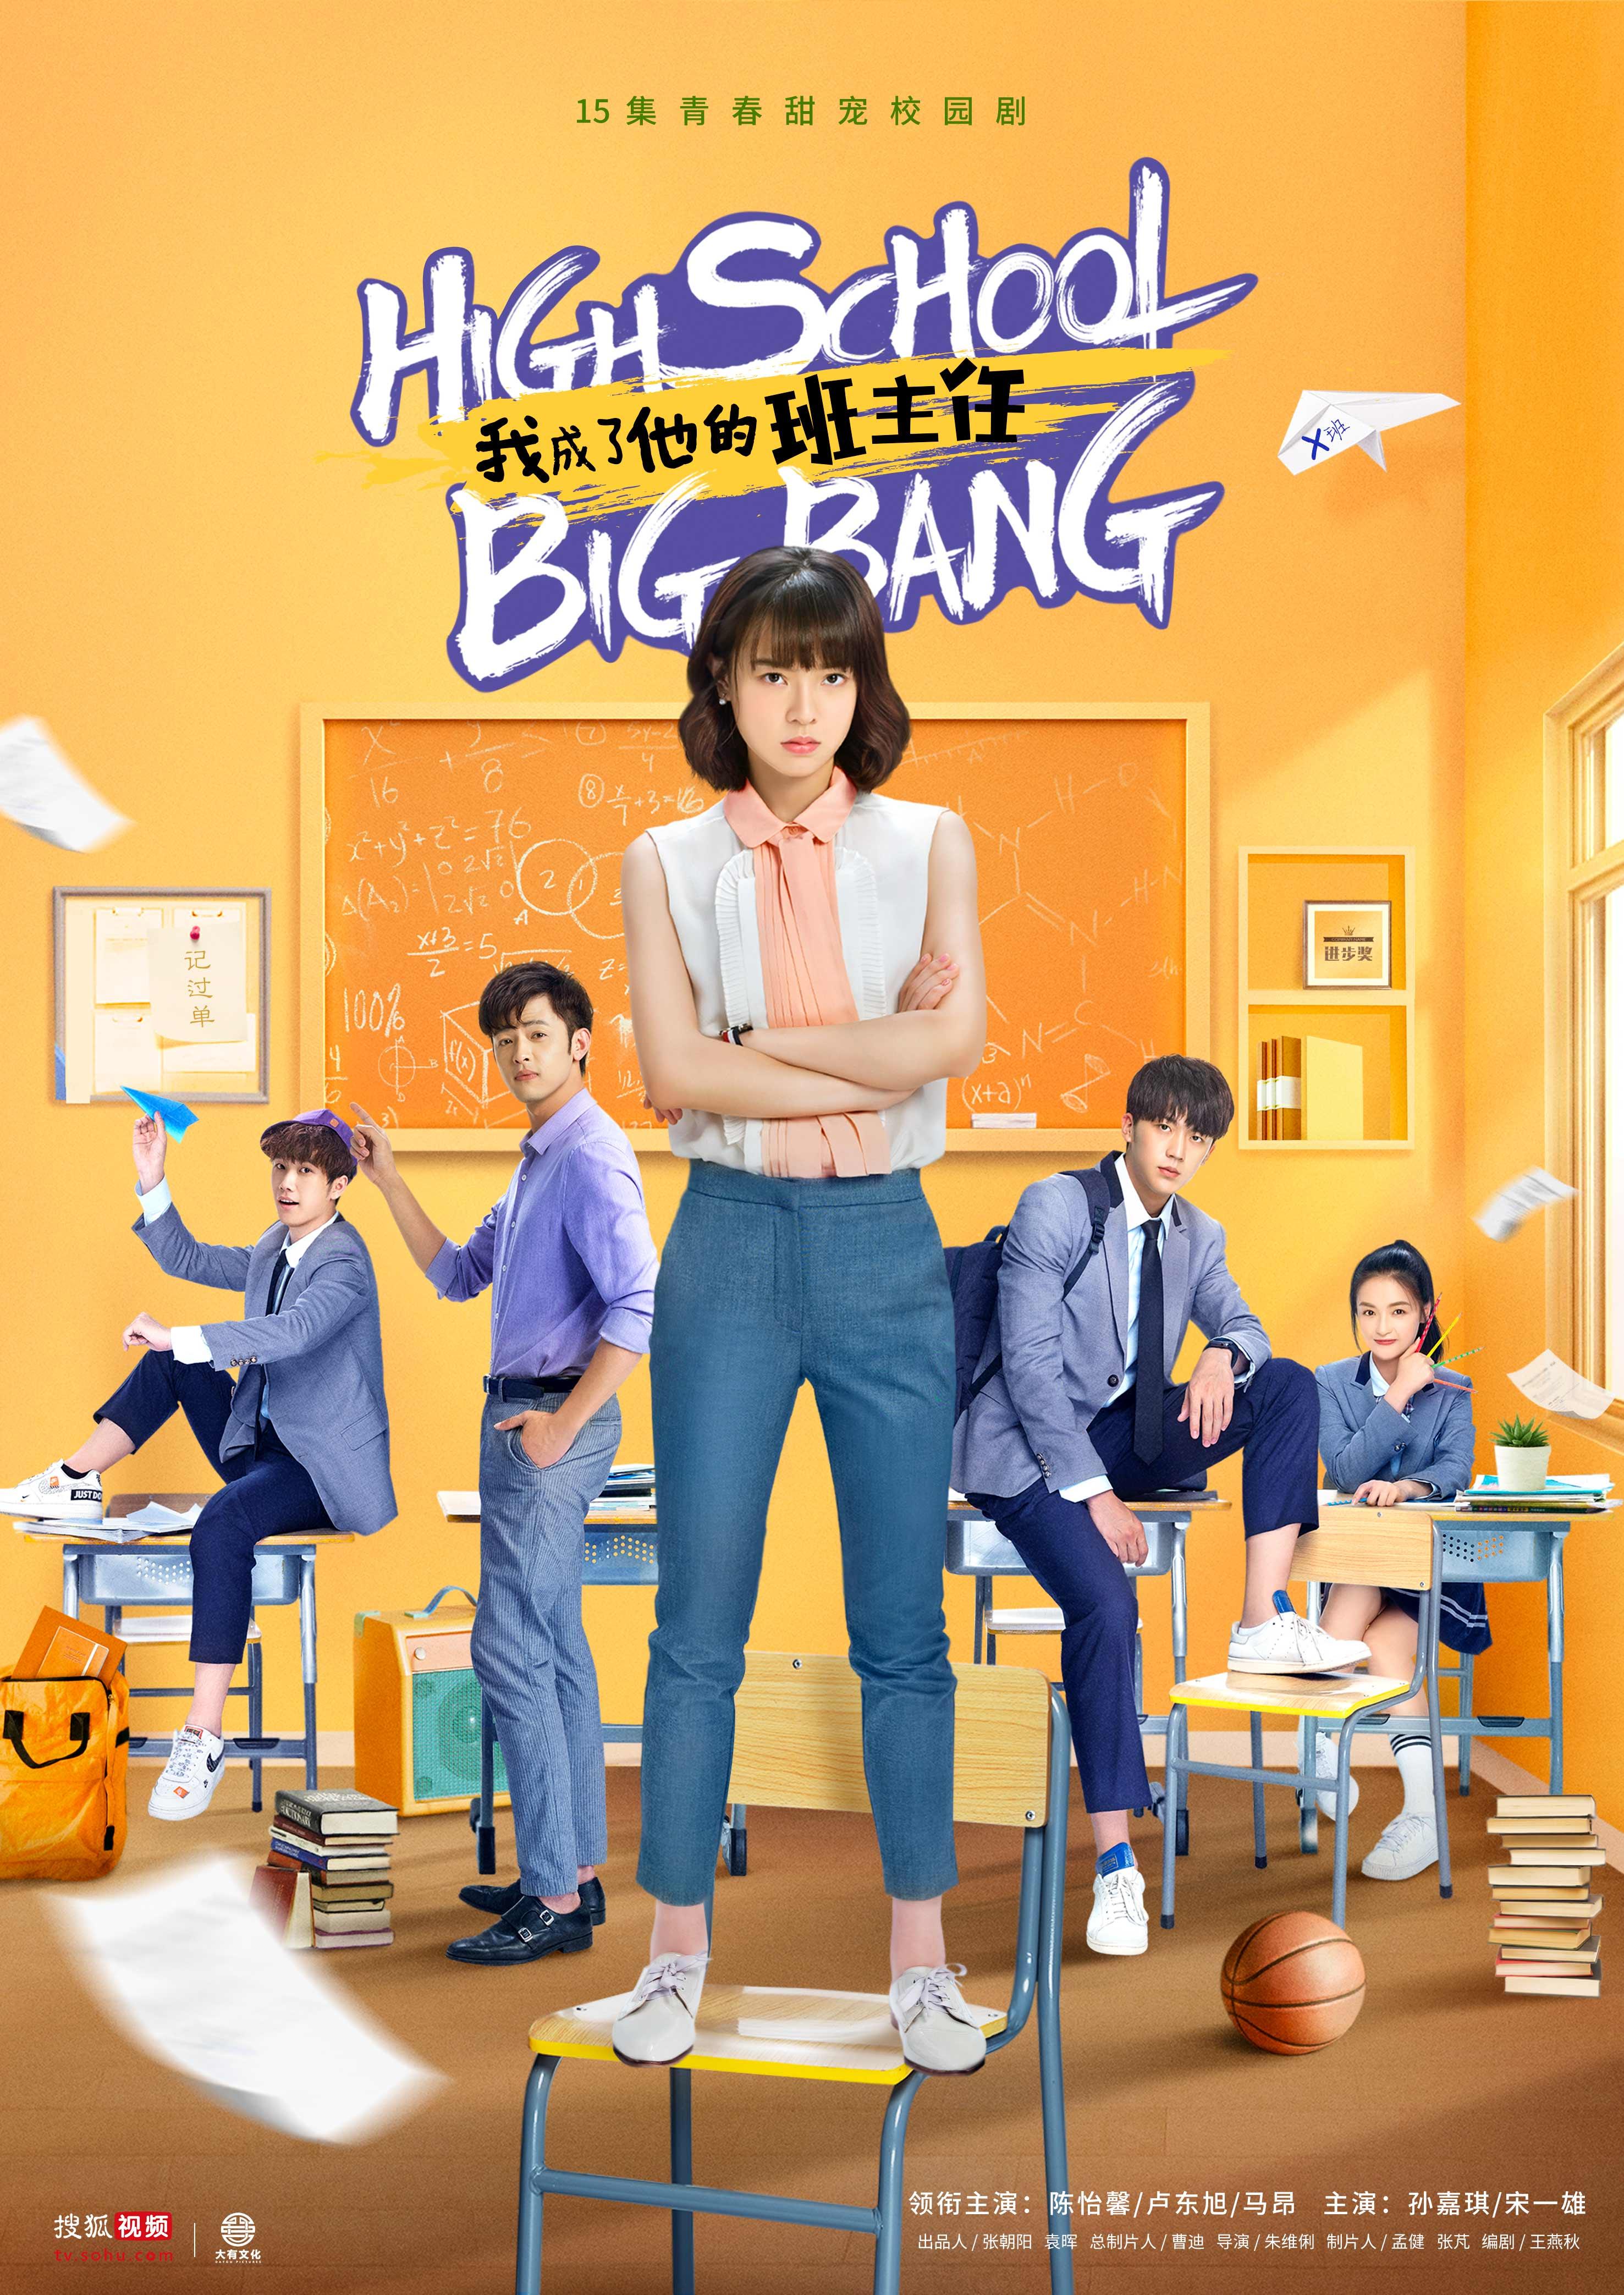 دانلود زیرنویس فارسی سریال High School Big Bang